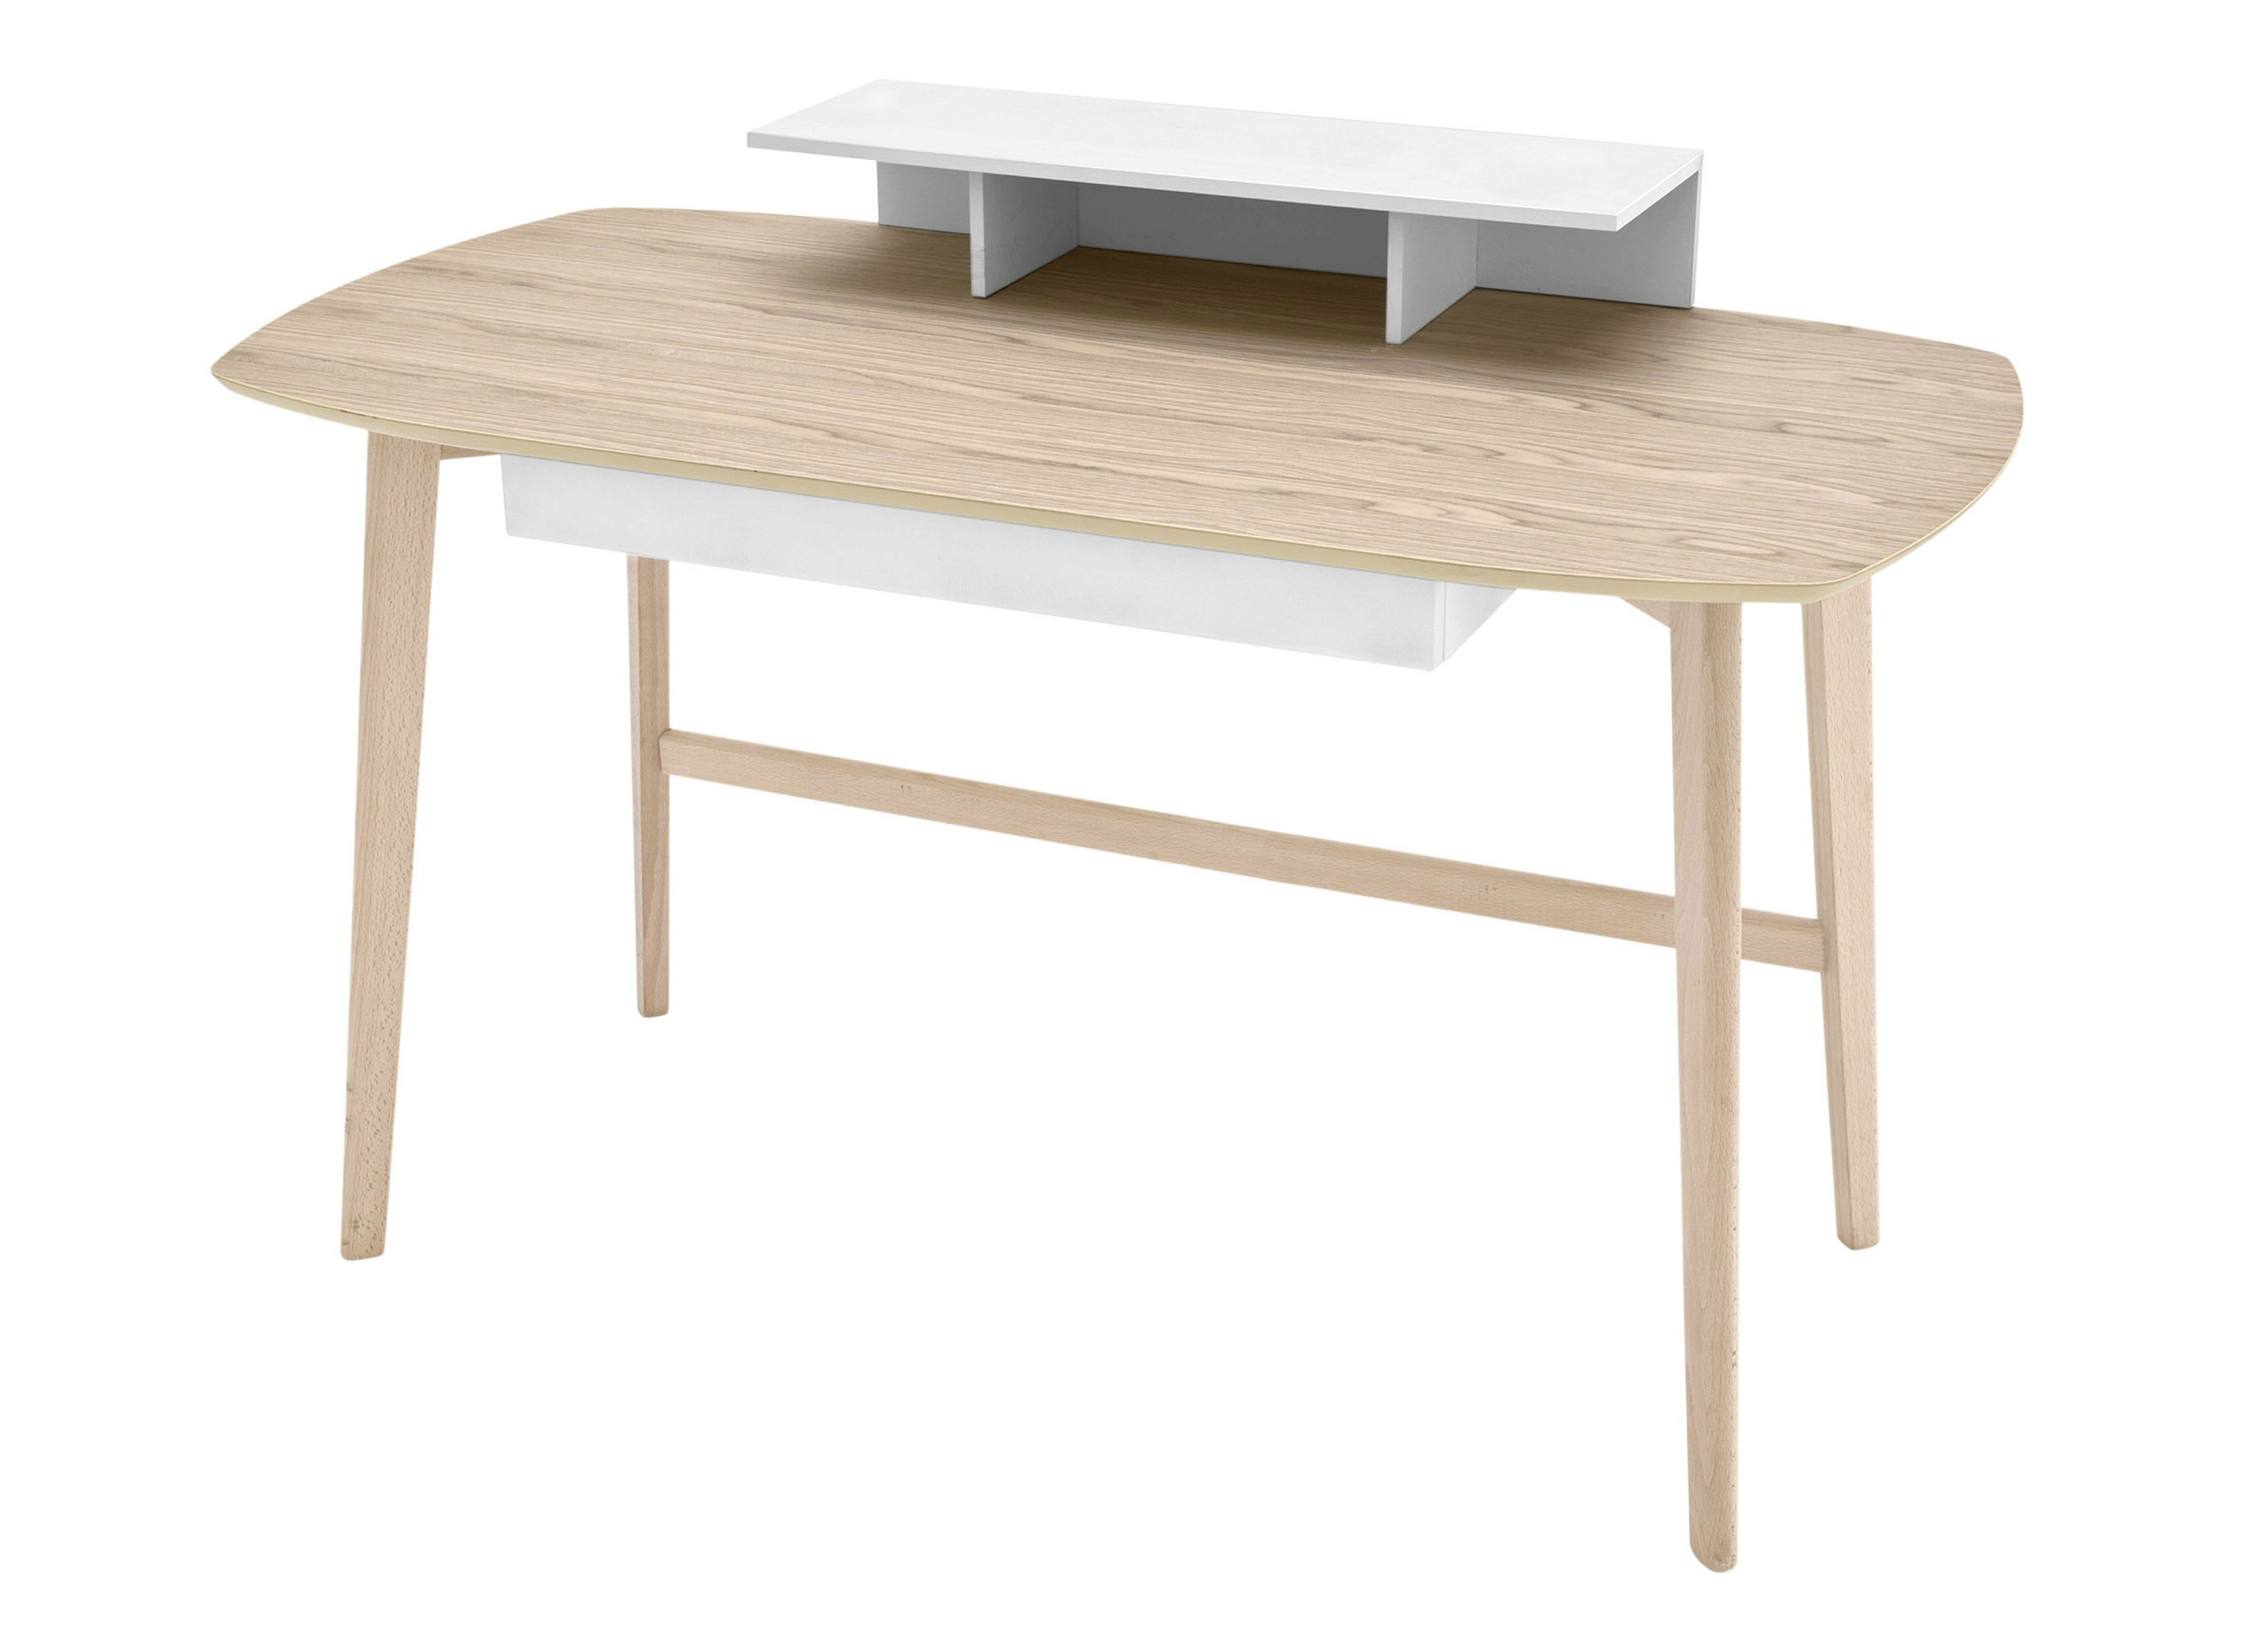 match writing desk by calligaris design gino carollo. Black Bedroom Furniture Sets. Home Design Ideas